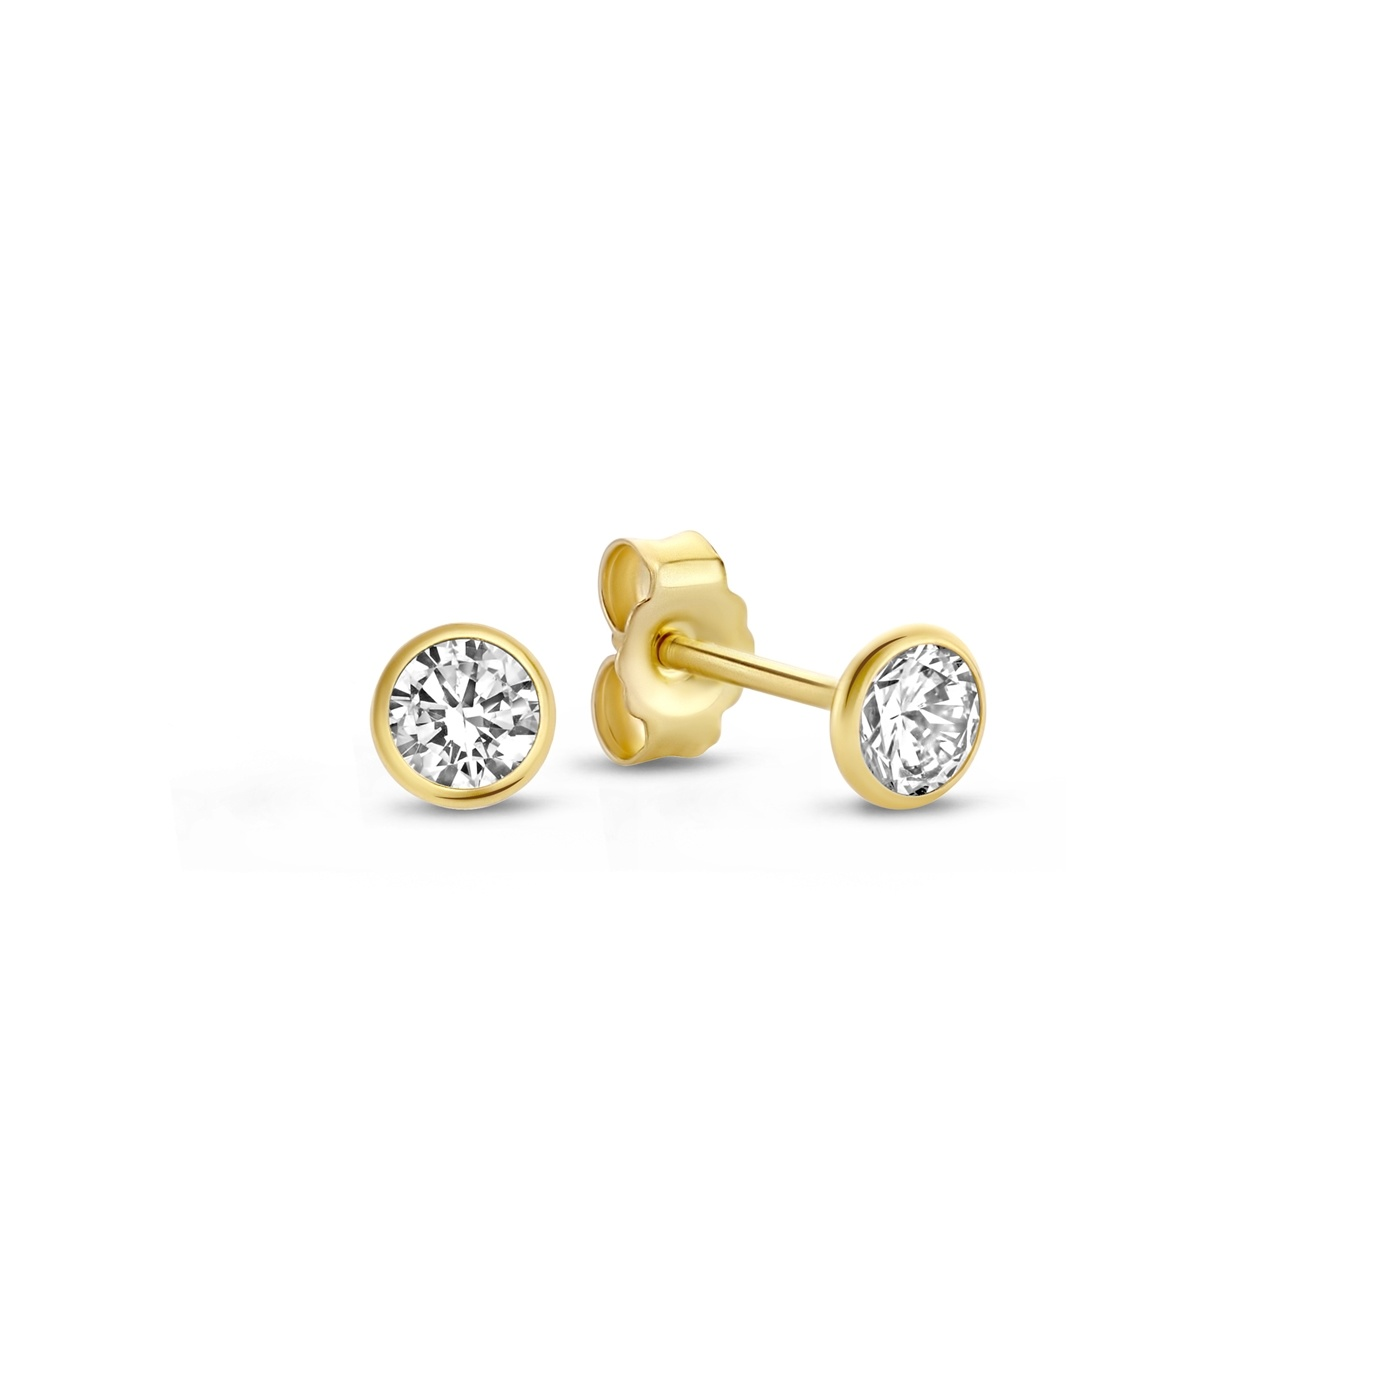 Isabel Bernard Rivoli Juliette 14 carat gold ear studs